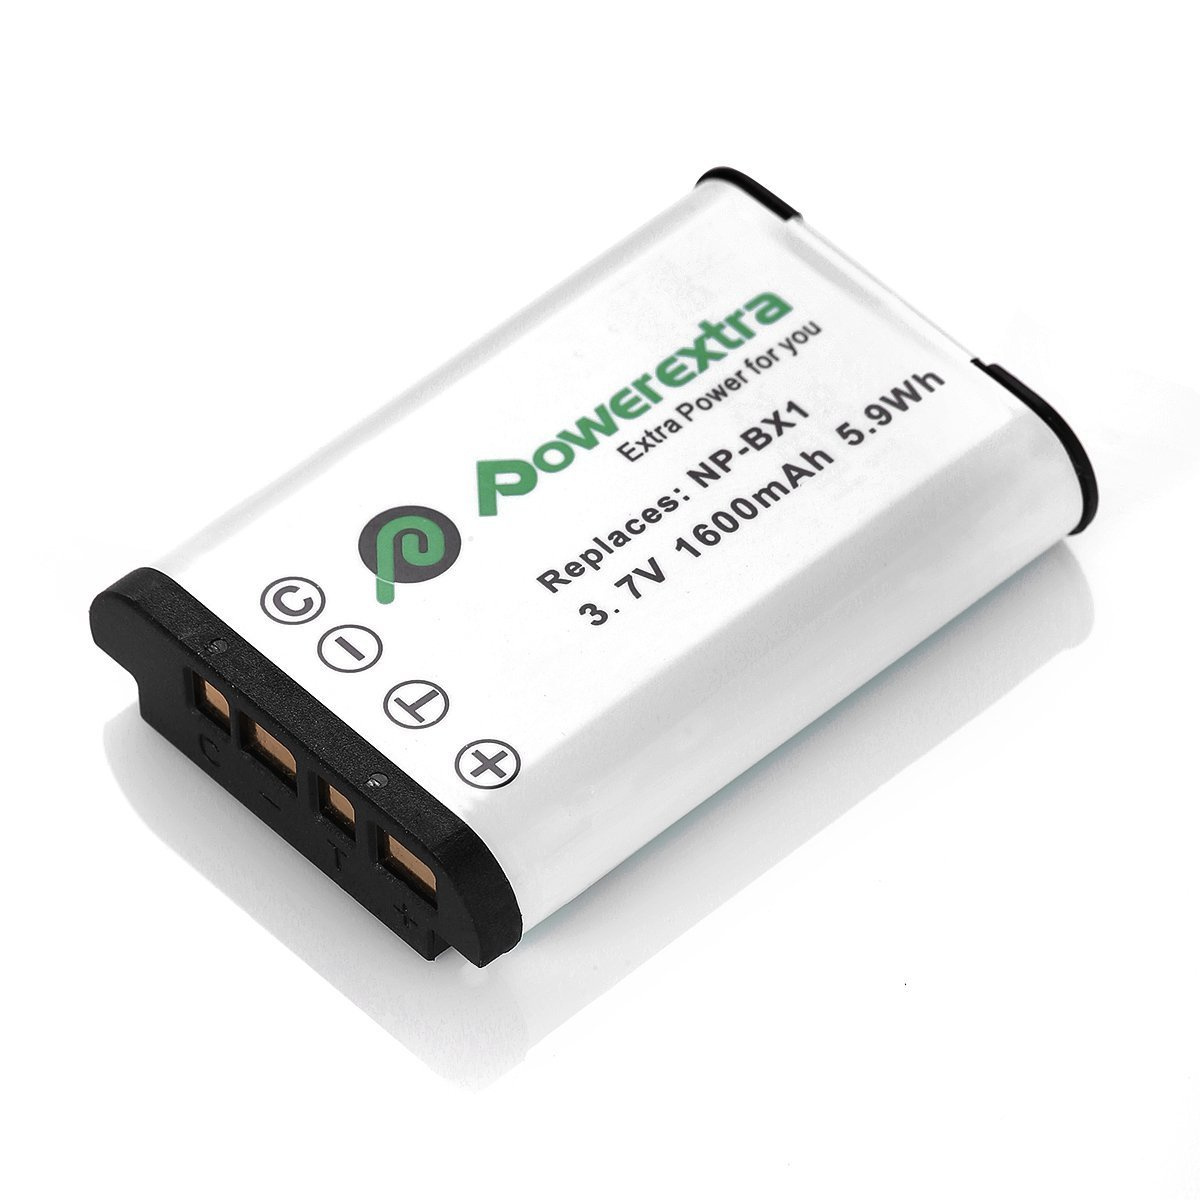 Powerextra 2 Pack Reemplazo Sony NP-BX1 Batería Li-ion para Sony NP-BX1 / M8 y Sony Cyber-shot DSC-RX100, DSC-RX100 II, DSC-RX100 III, DSC-RX100 V, DSC-RX100 IV, HDR-CX405